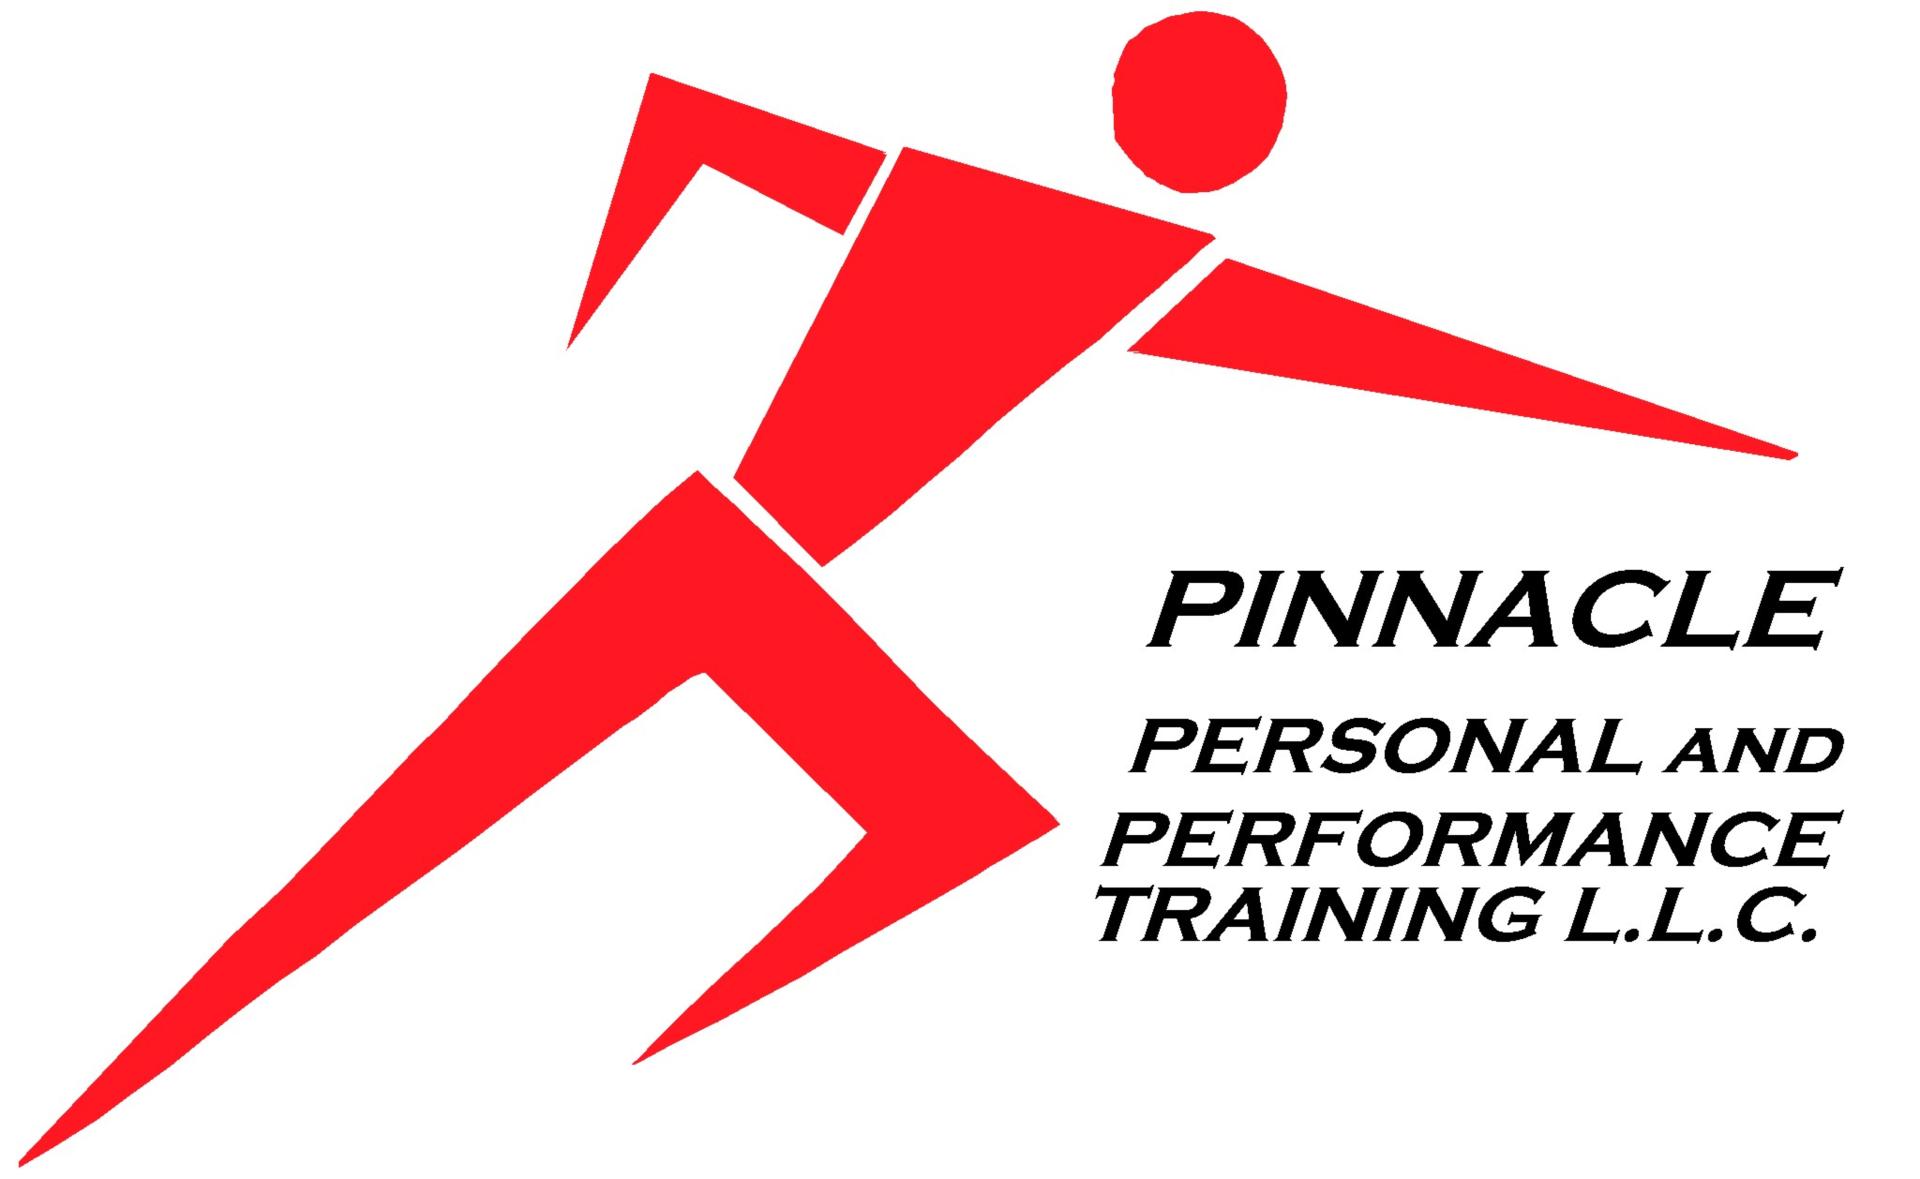 Pinnacle Personal And Performance Training Llc